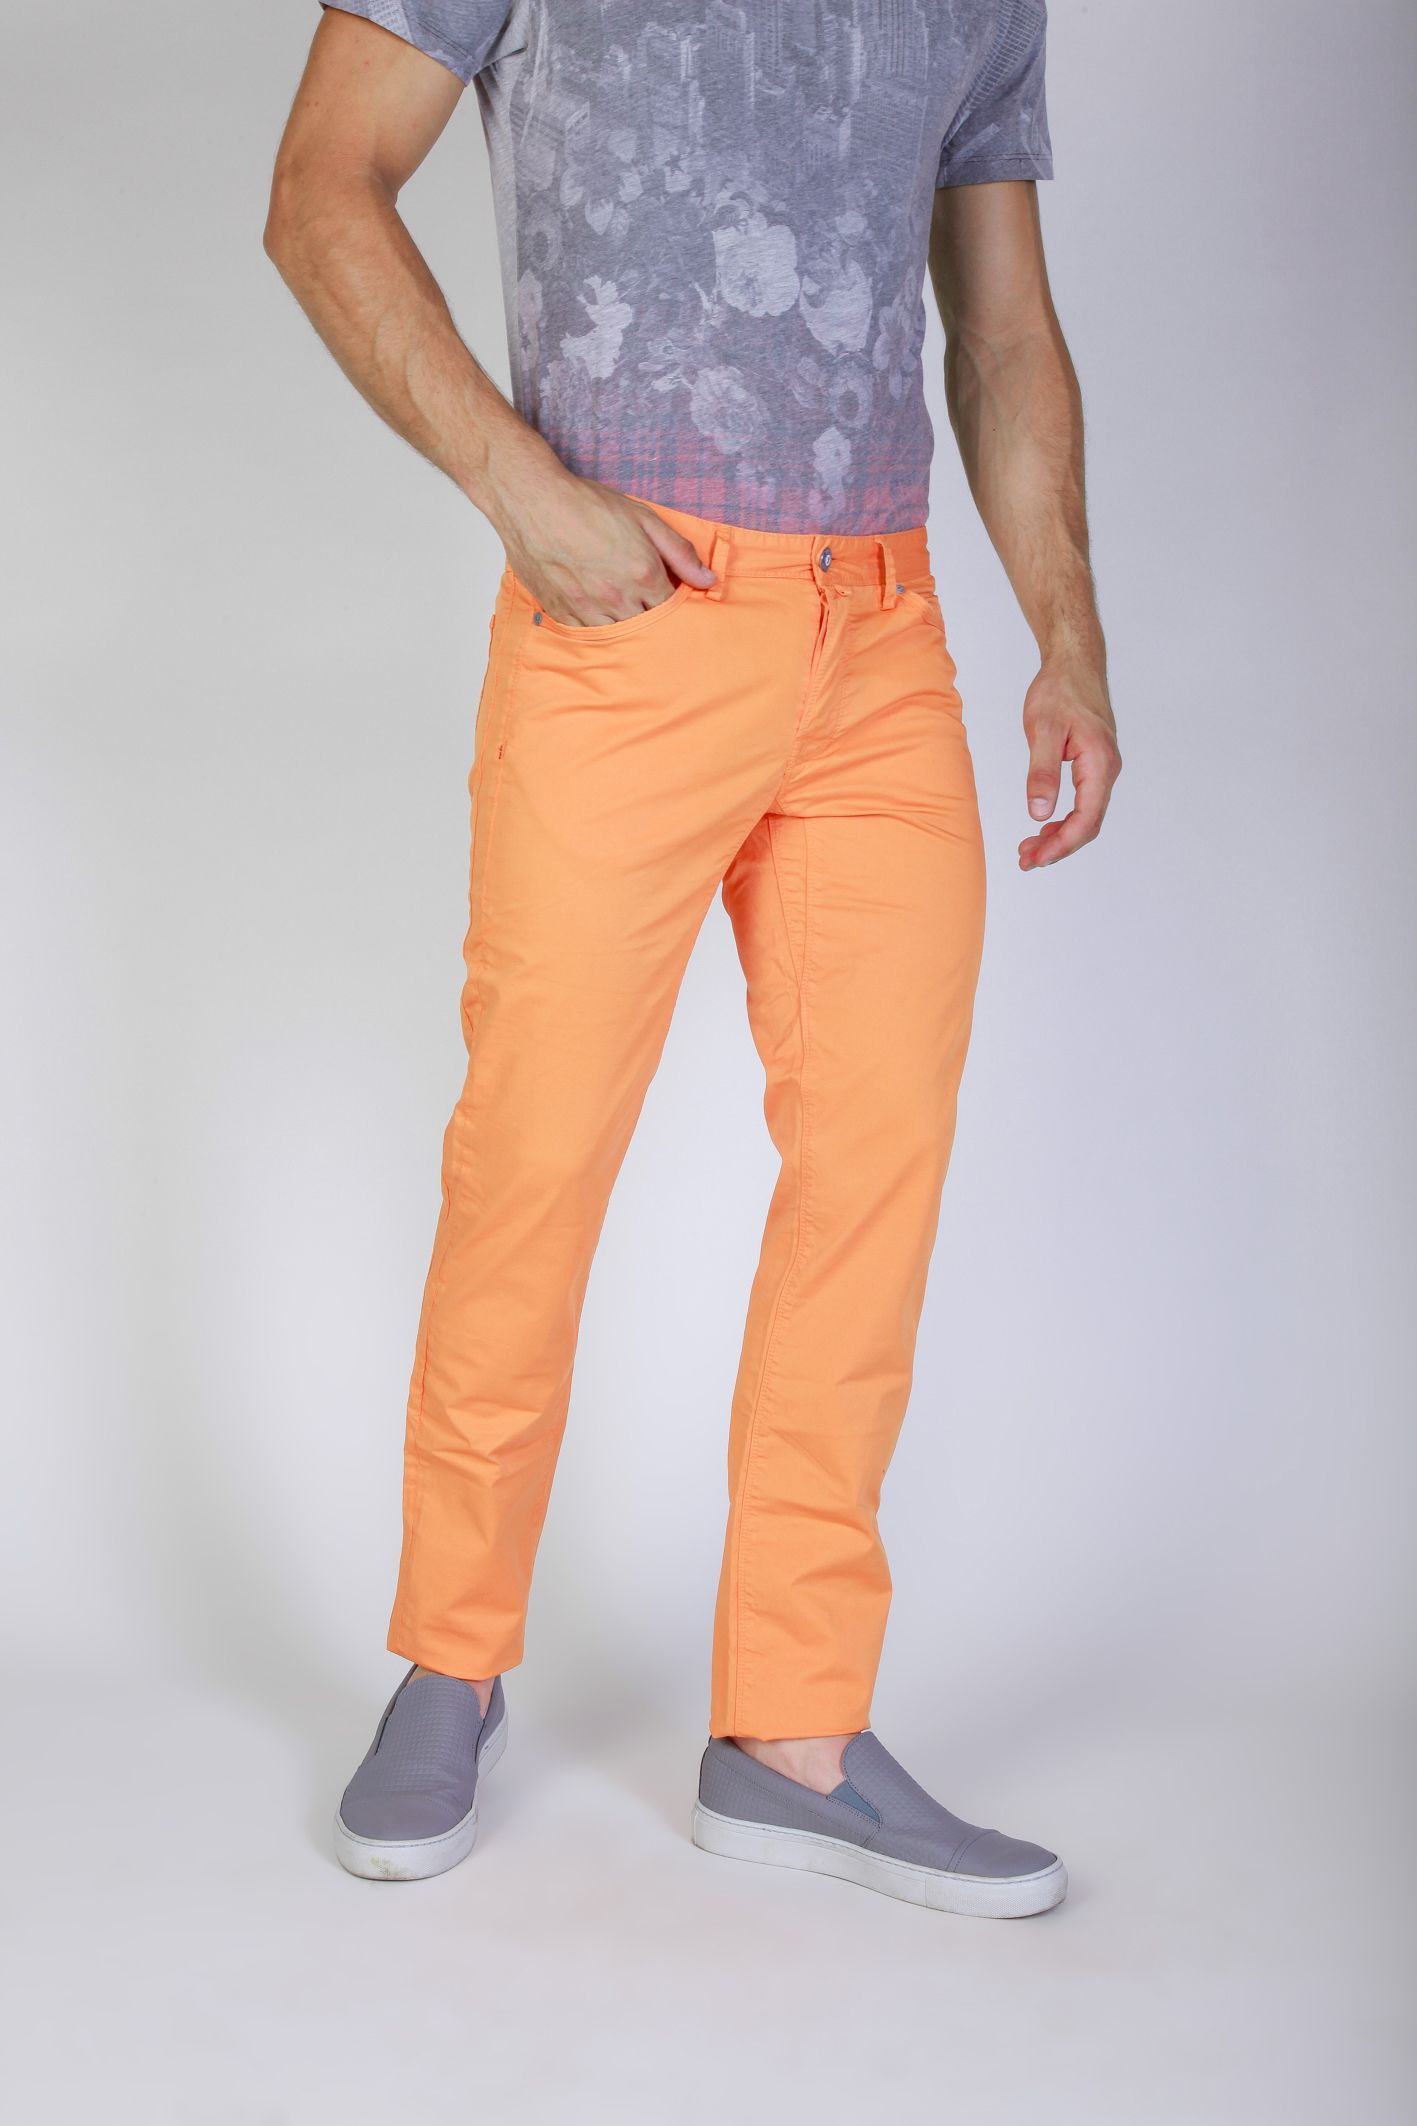 Spodnie Jaggy Męskie